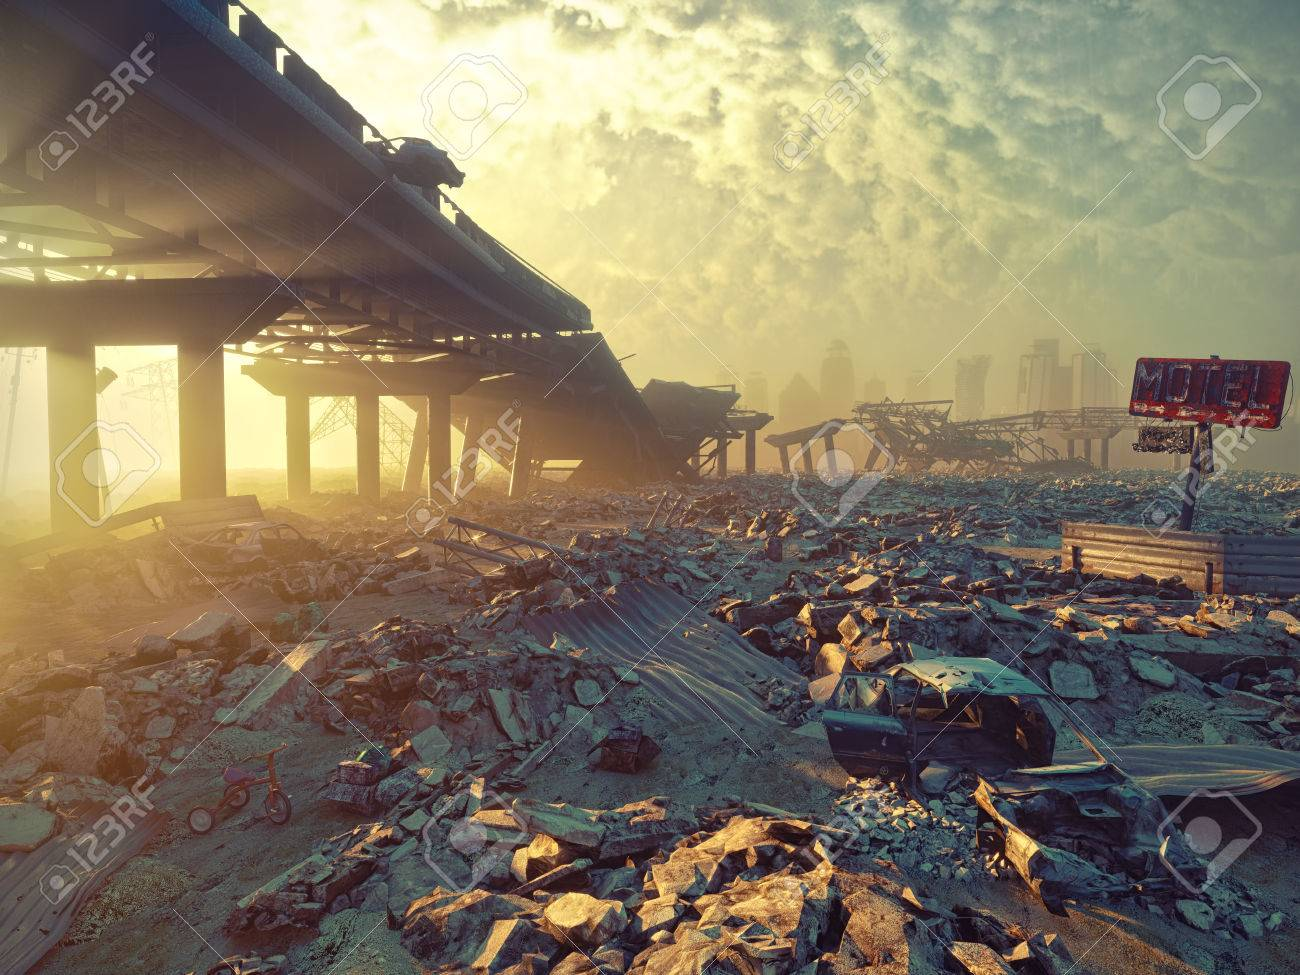 Ruins of a city. Apocalyptic landscape.3d illustration concept - 69216556